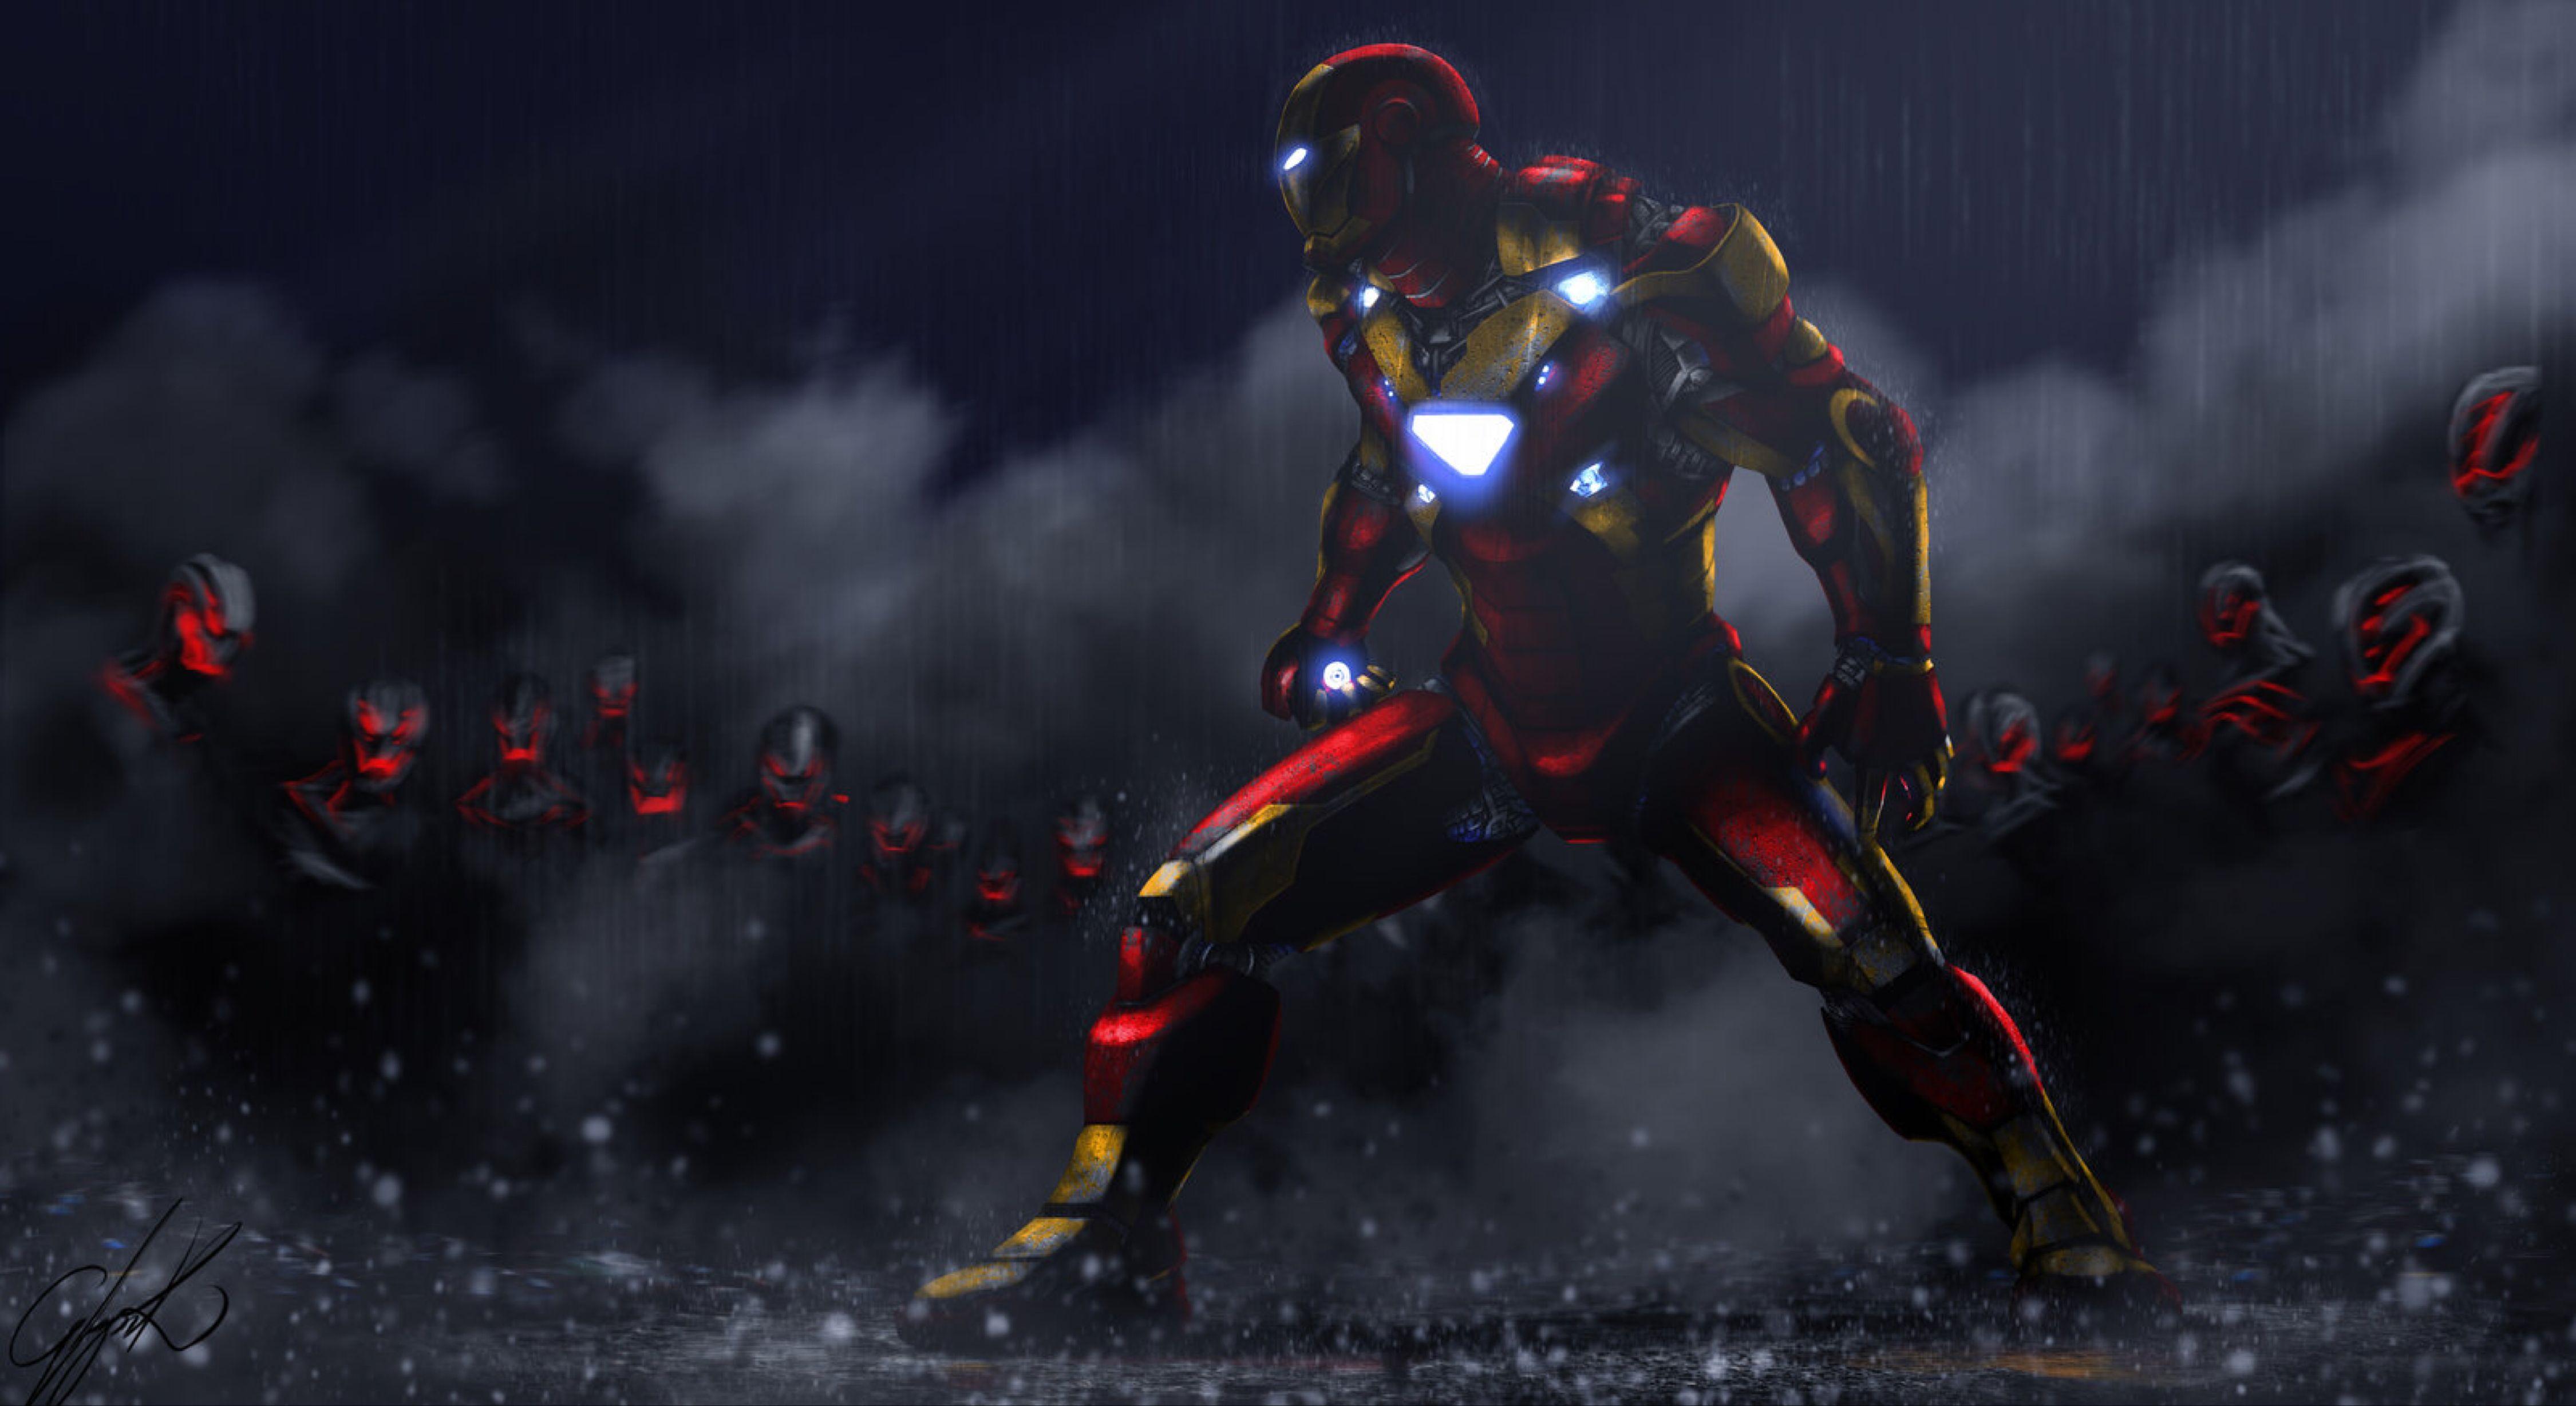 1920x1080 5k Iron Man 2018 Laptop Full HD 1080P HD 4k ...